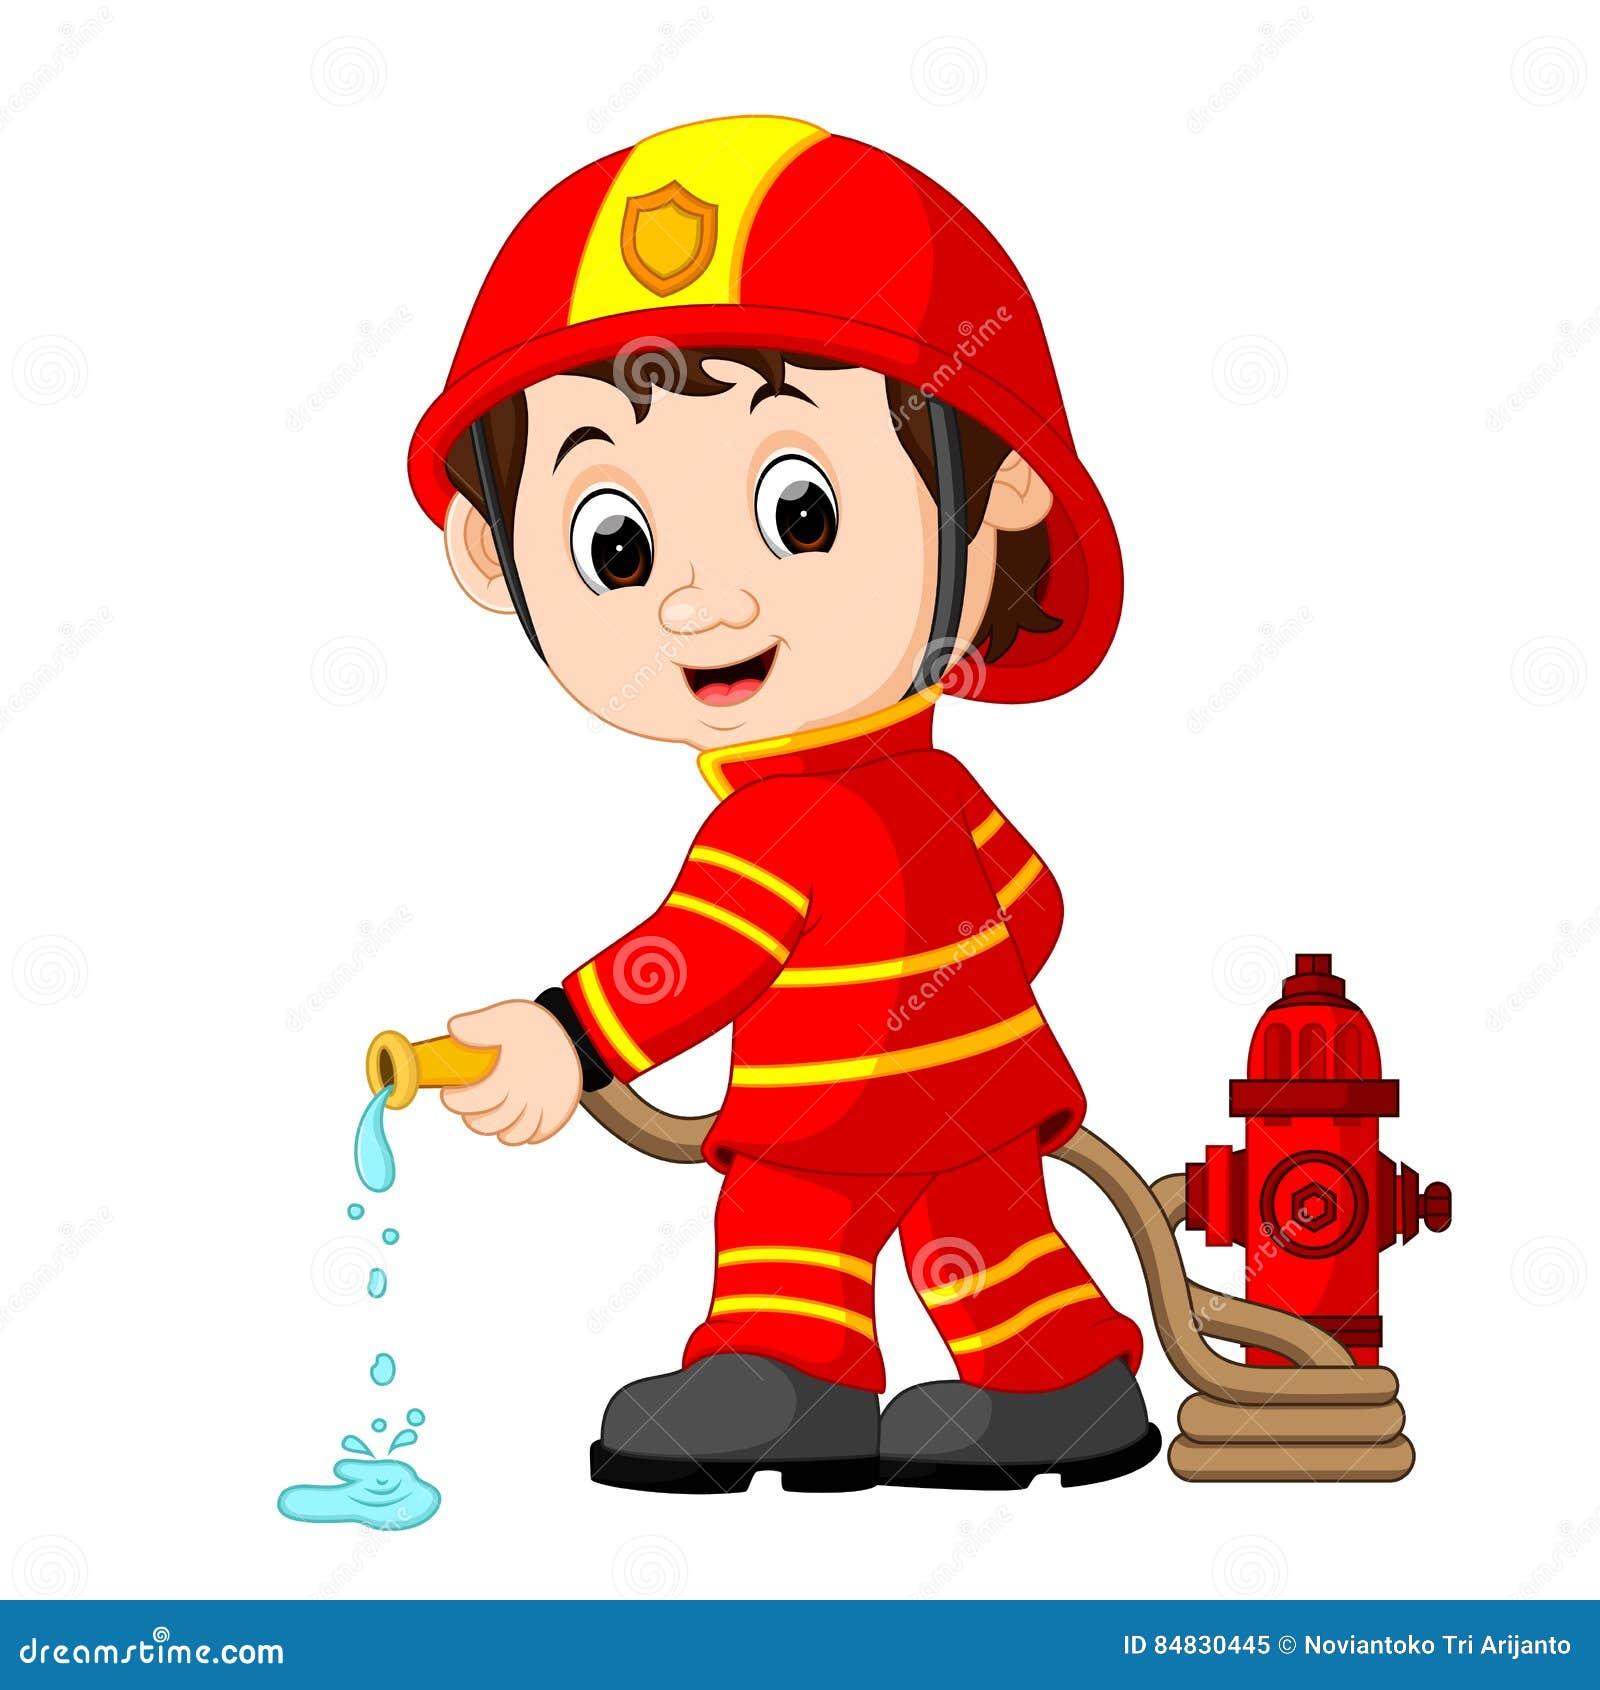 Fireman Cartoons, Illustrations & Vector Stock Images